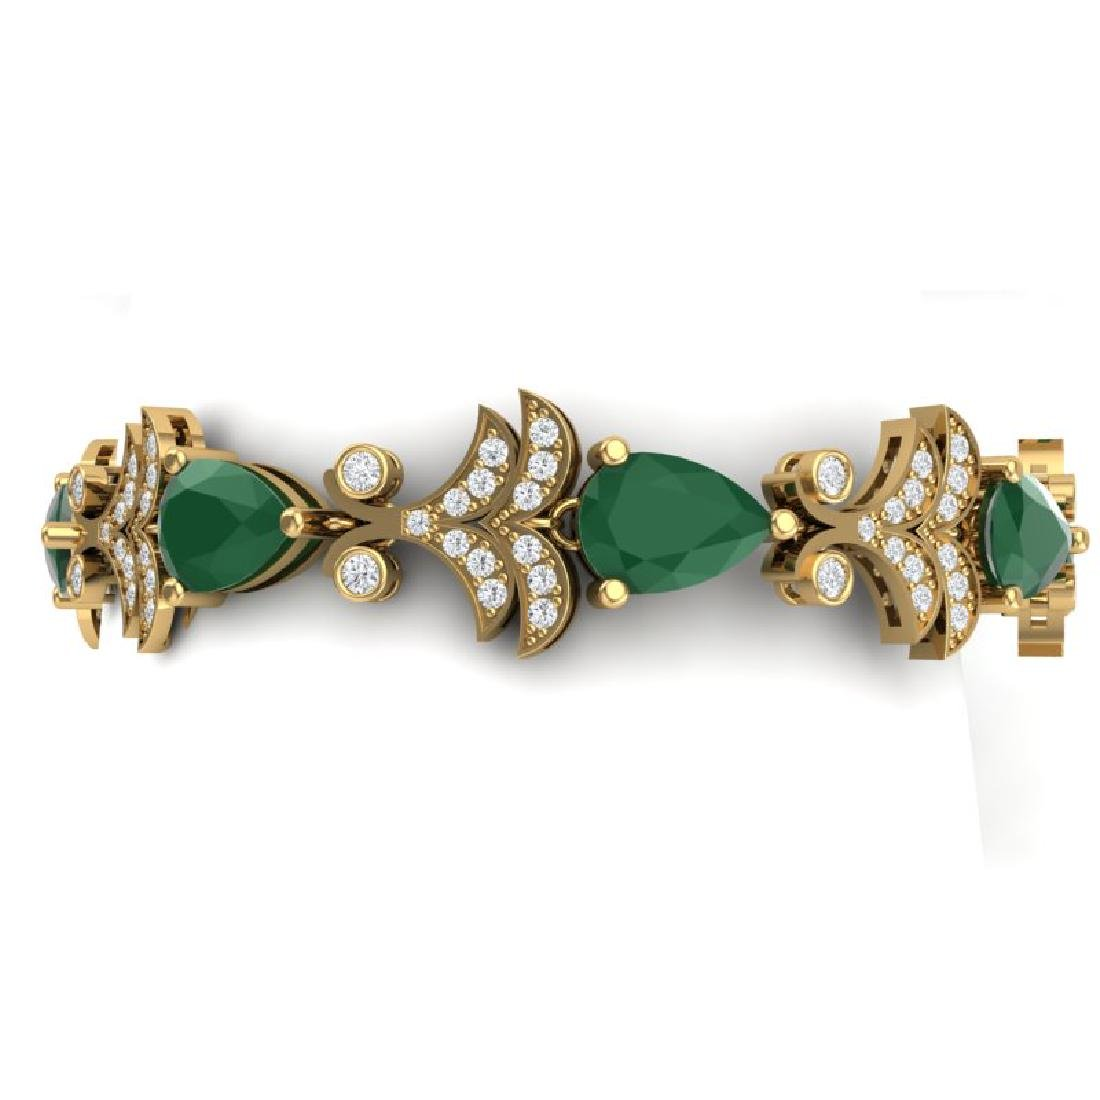 24.8 CTW Royalty Emerald & VS Diamond Bracelet 18K